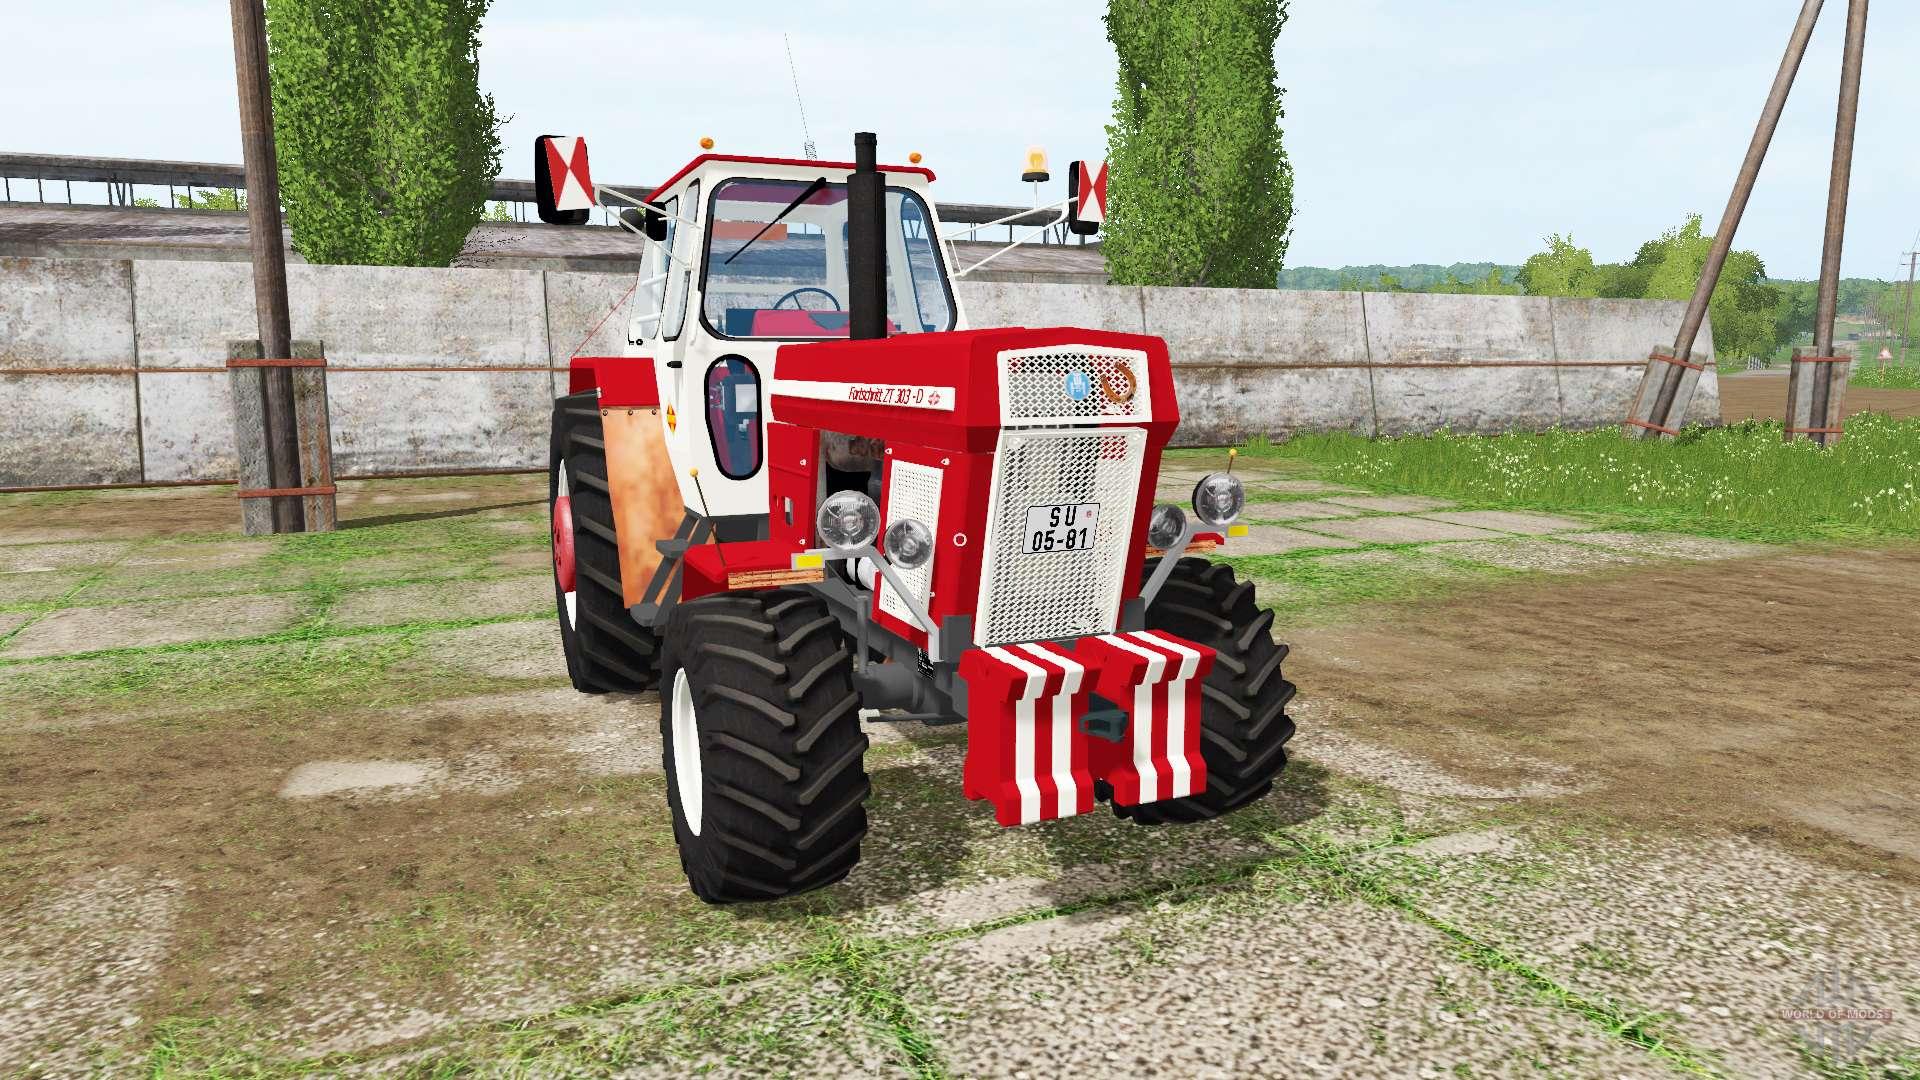 Трактор мтз-82.1 с куном., Цена:700000 RUB ,Тип объявления.